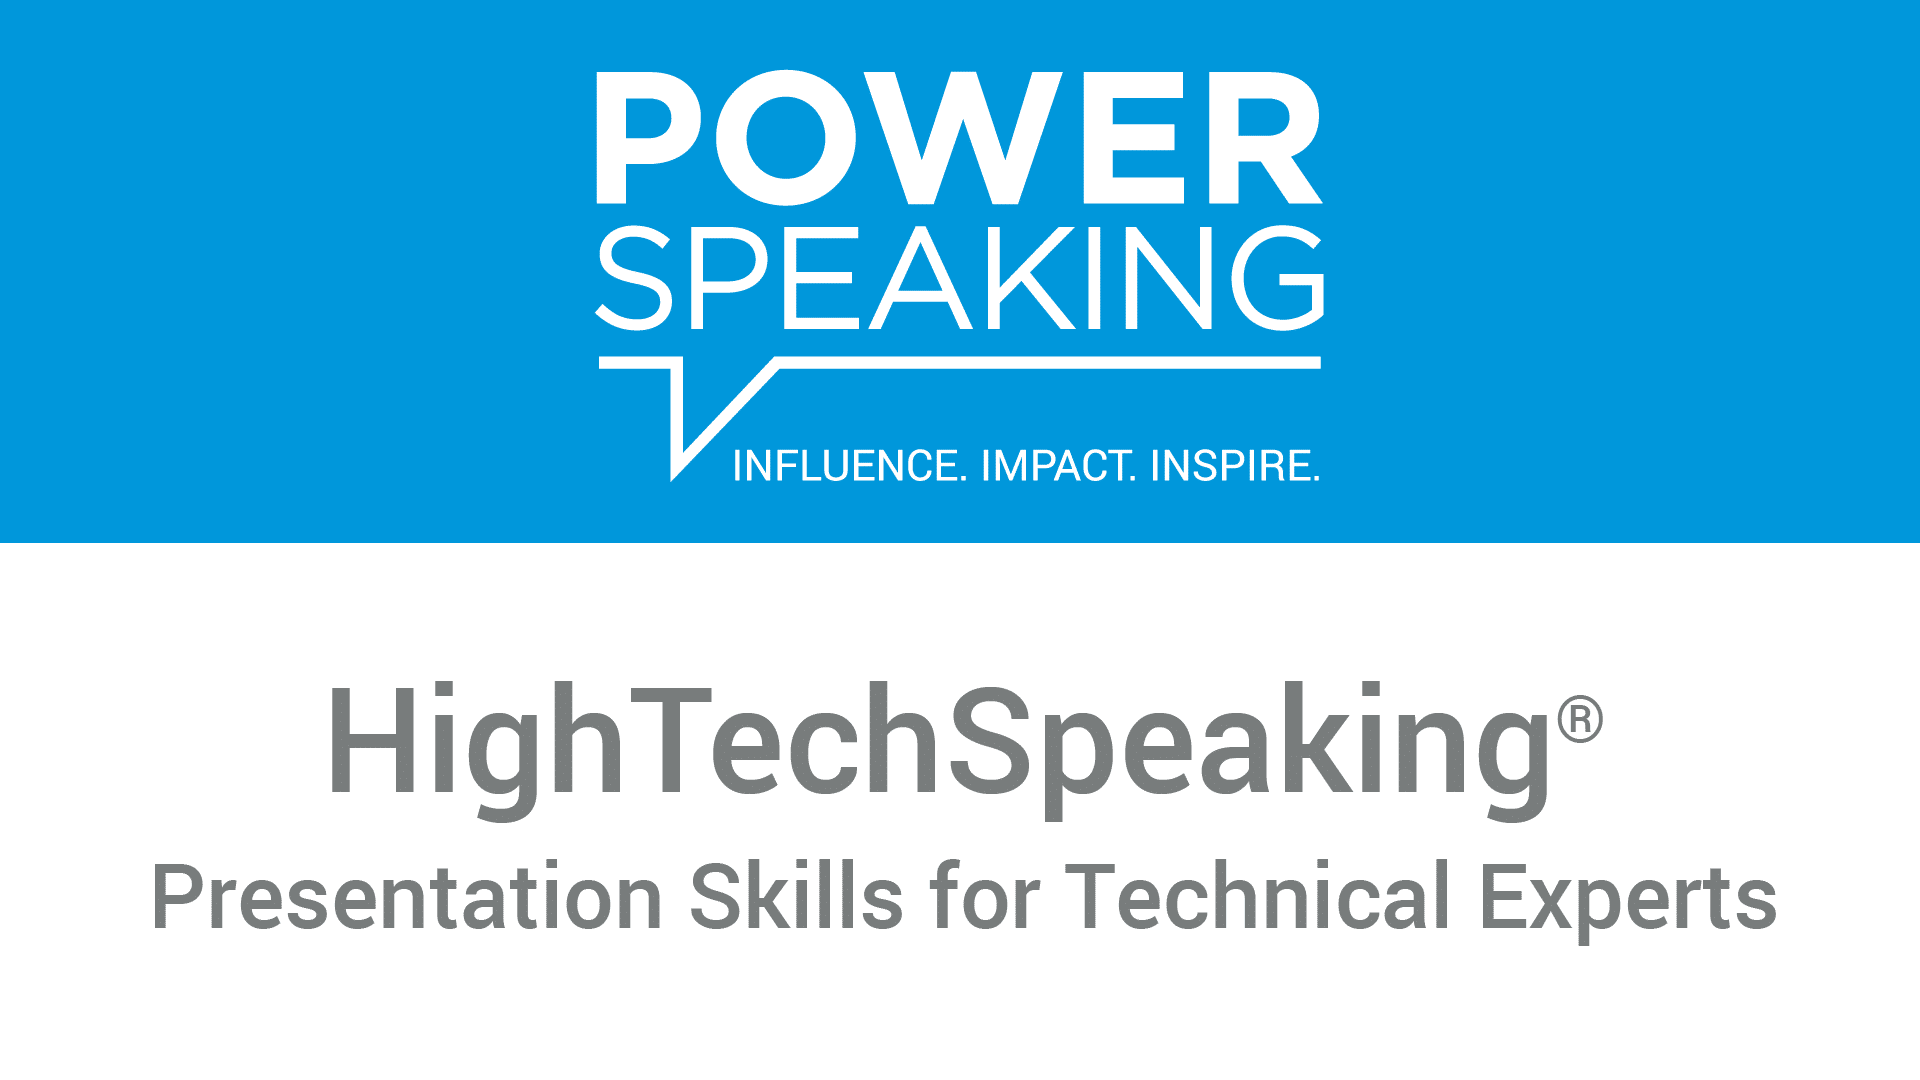 PowerStart High Tech Speaking®